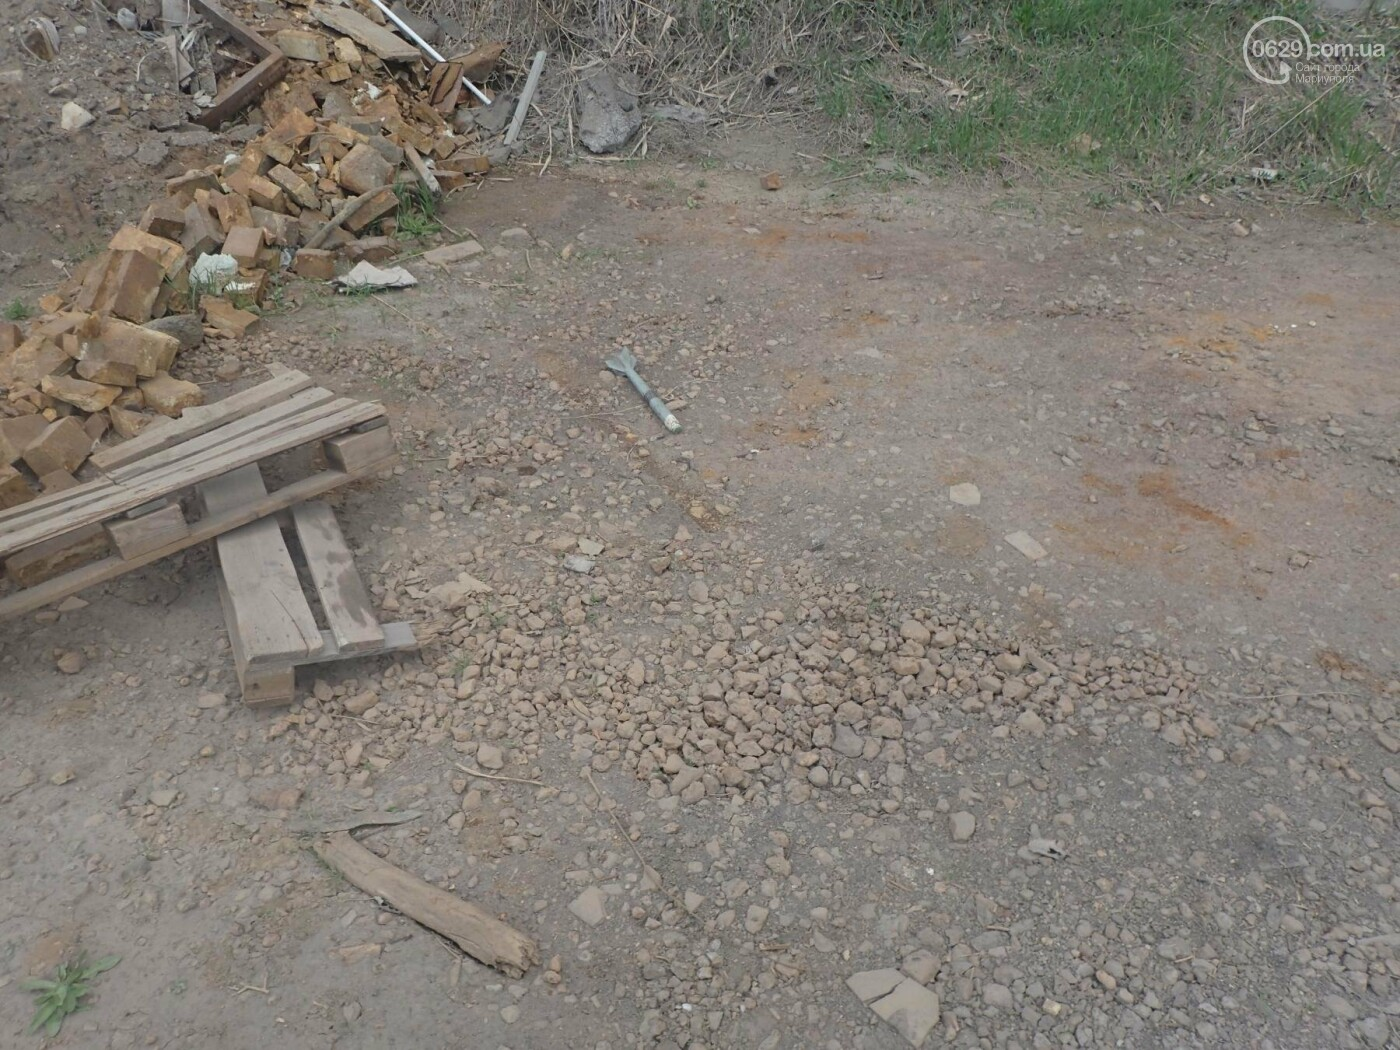 В Мариуполе на территории ММКИ нашли бронебойный снаряд (ДОПОЛНЕНО, ФОТО), фото-1